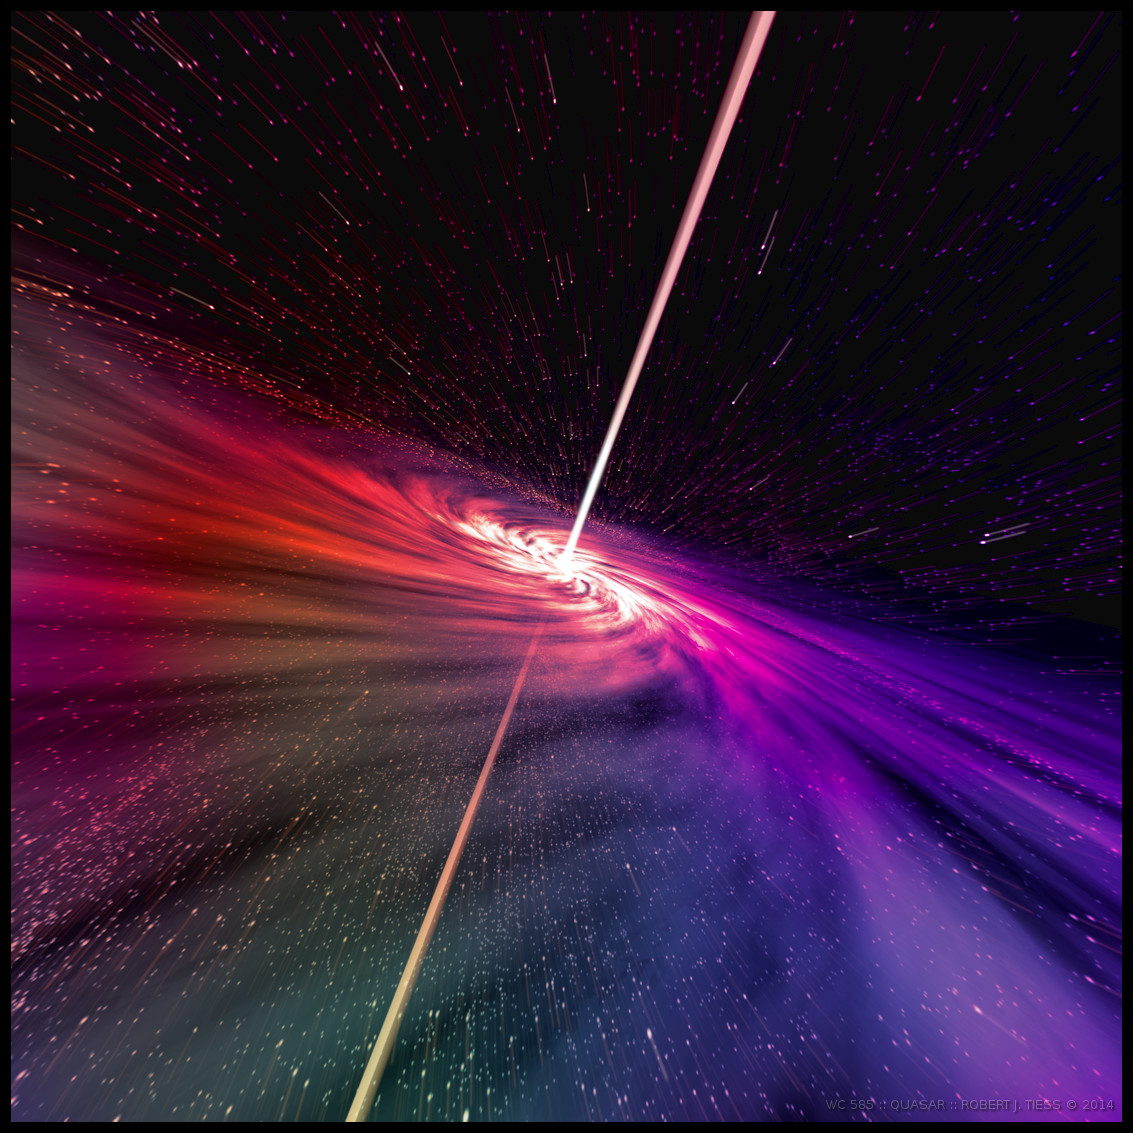 Quasar - By Robert J. Tiess